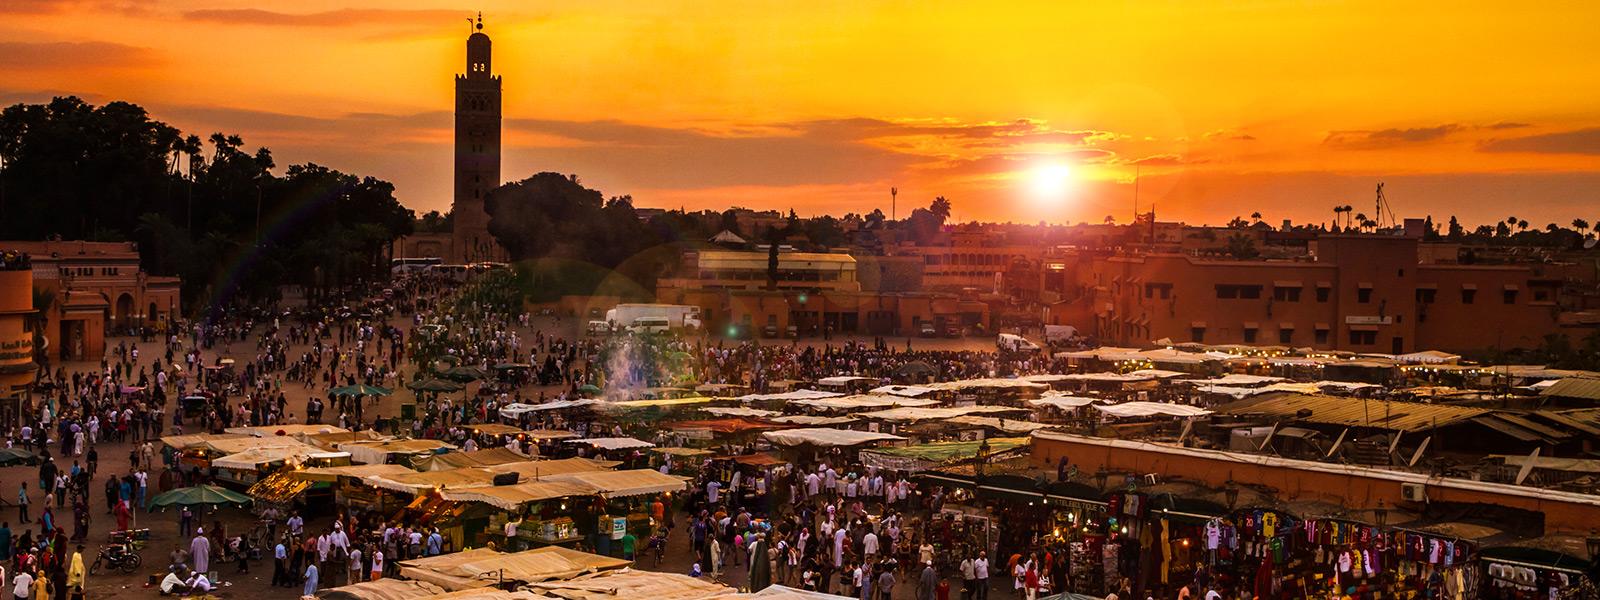 cosa vedere a marrakech citt da visitare africa